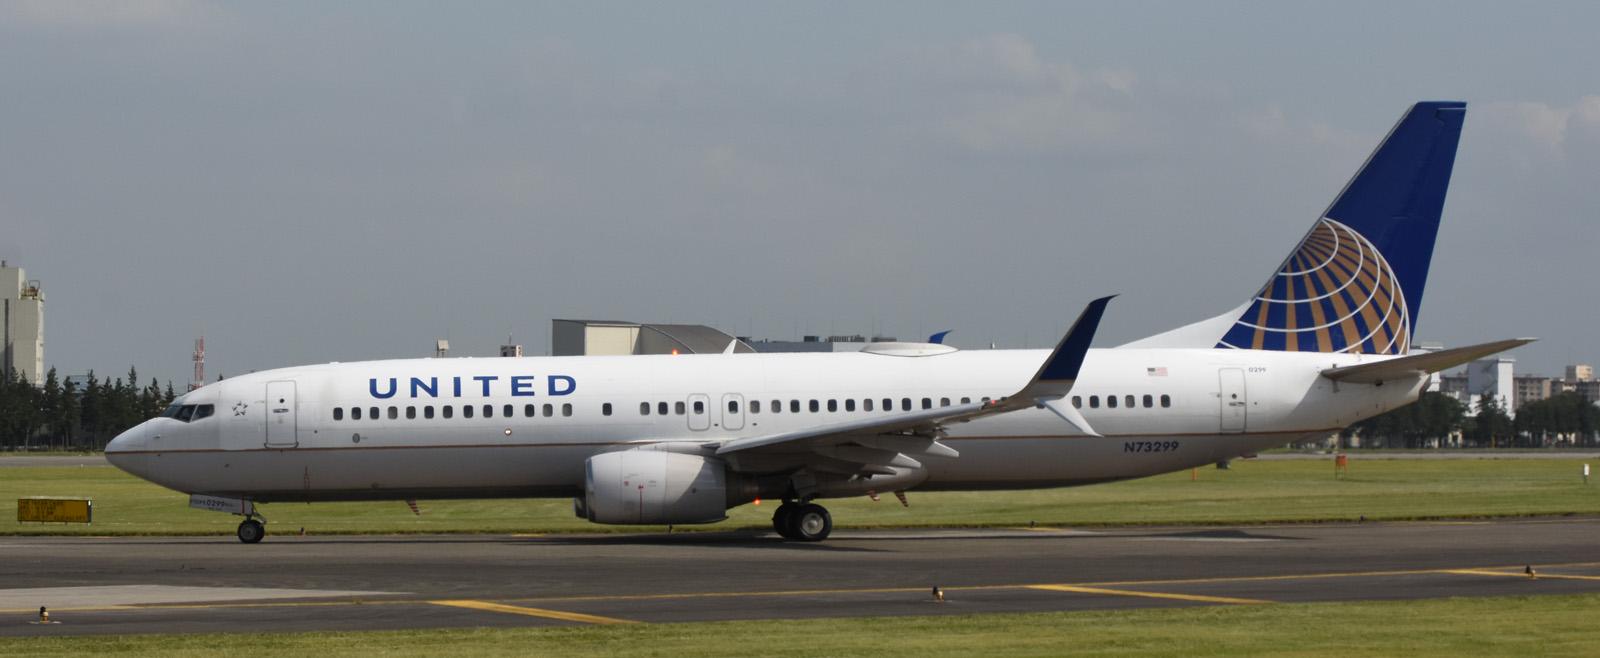 United170919g724